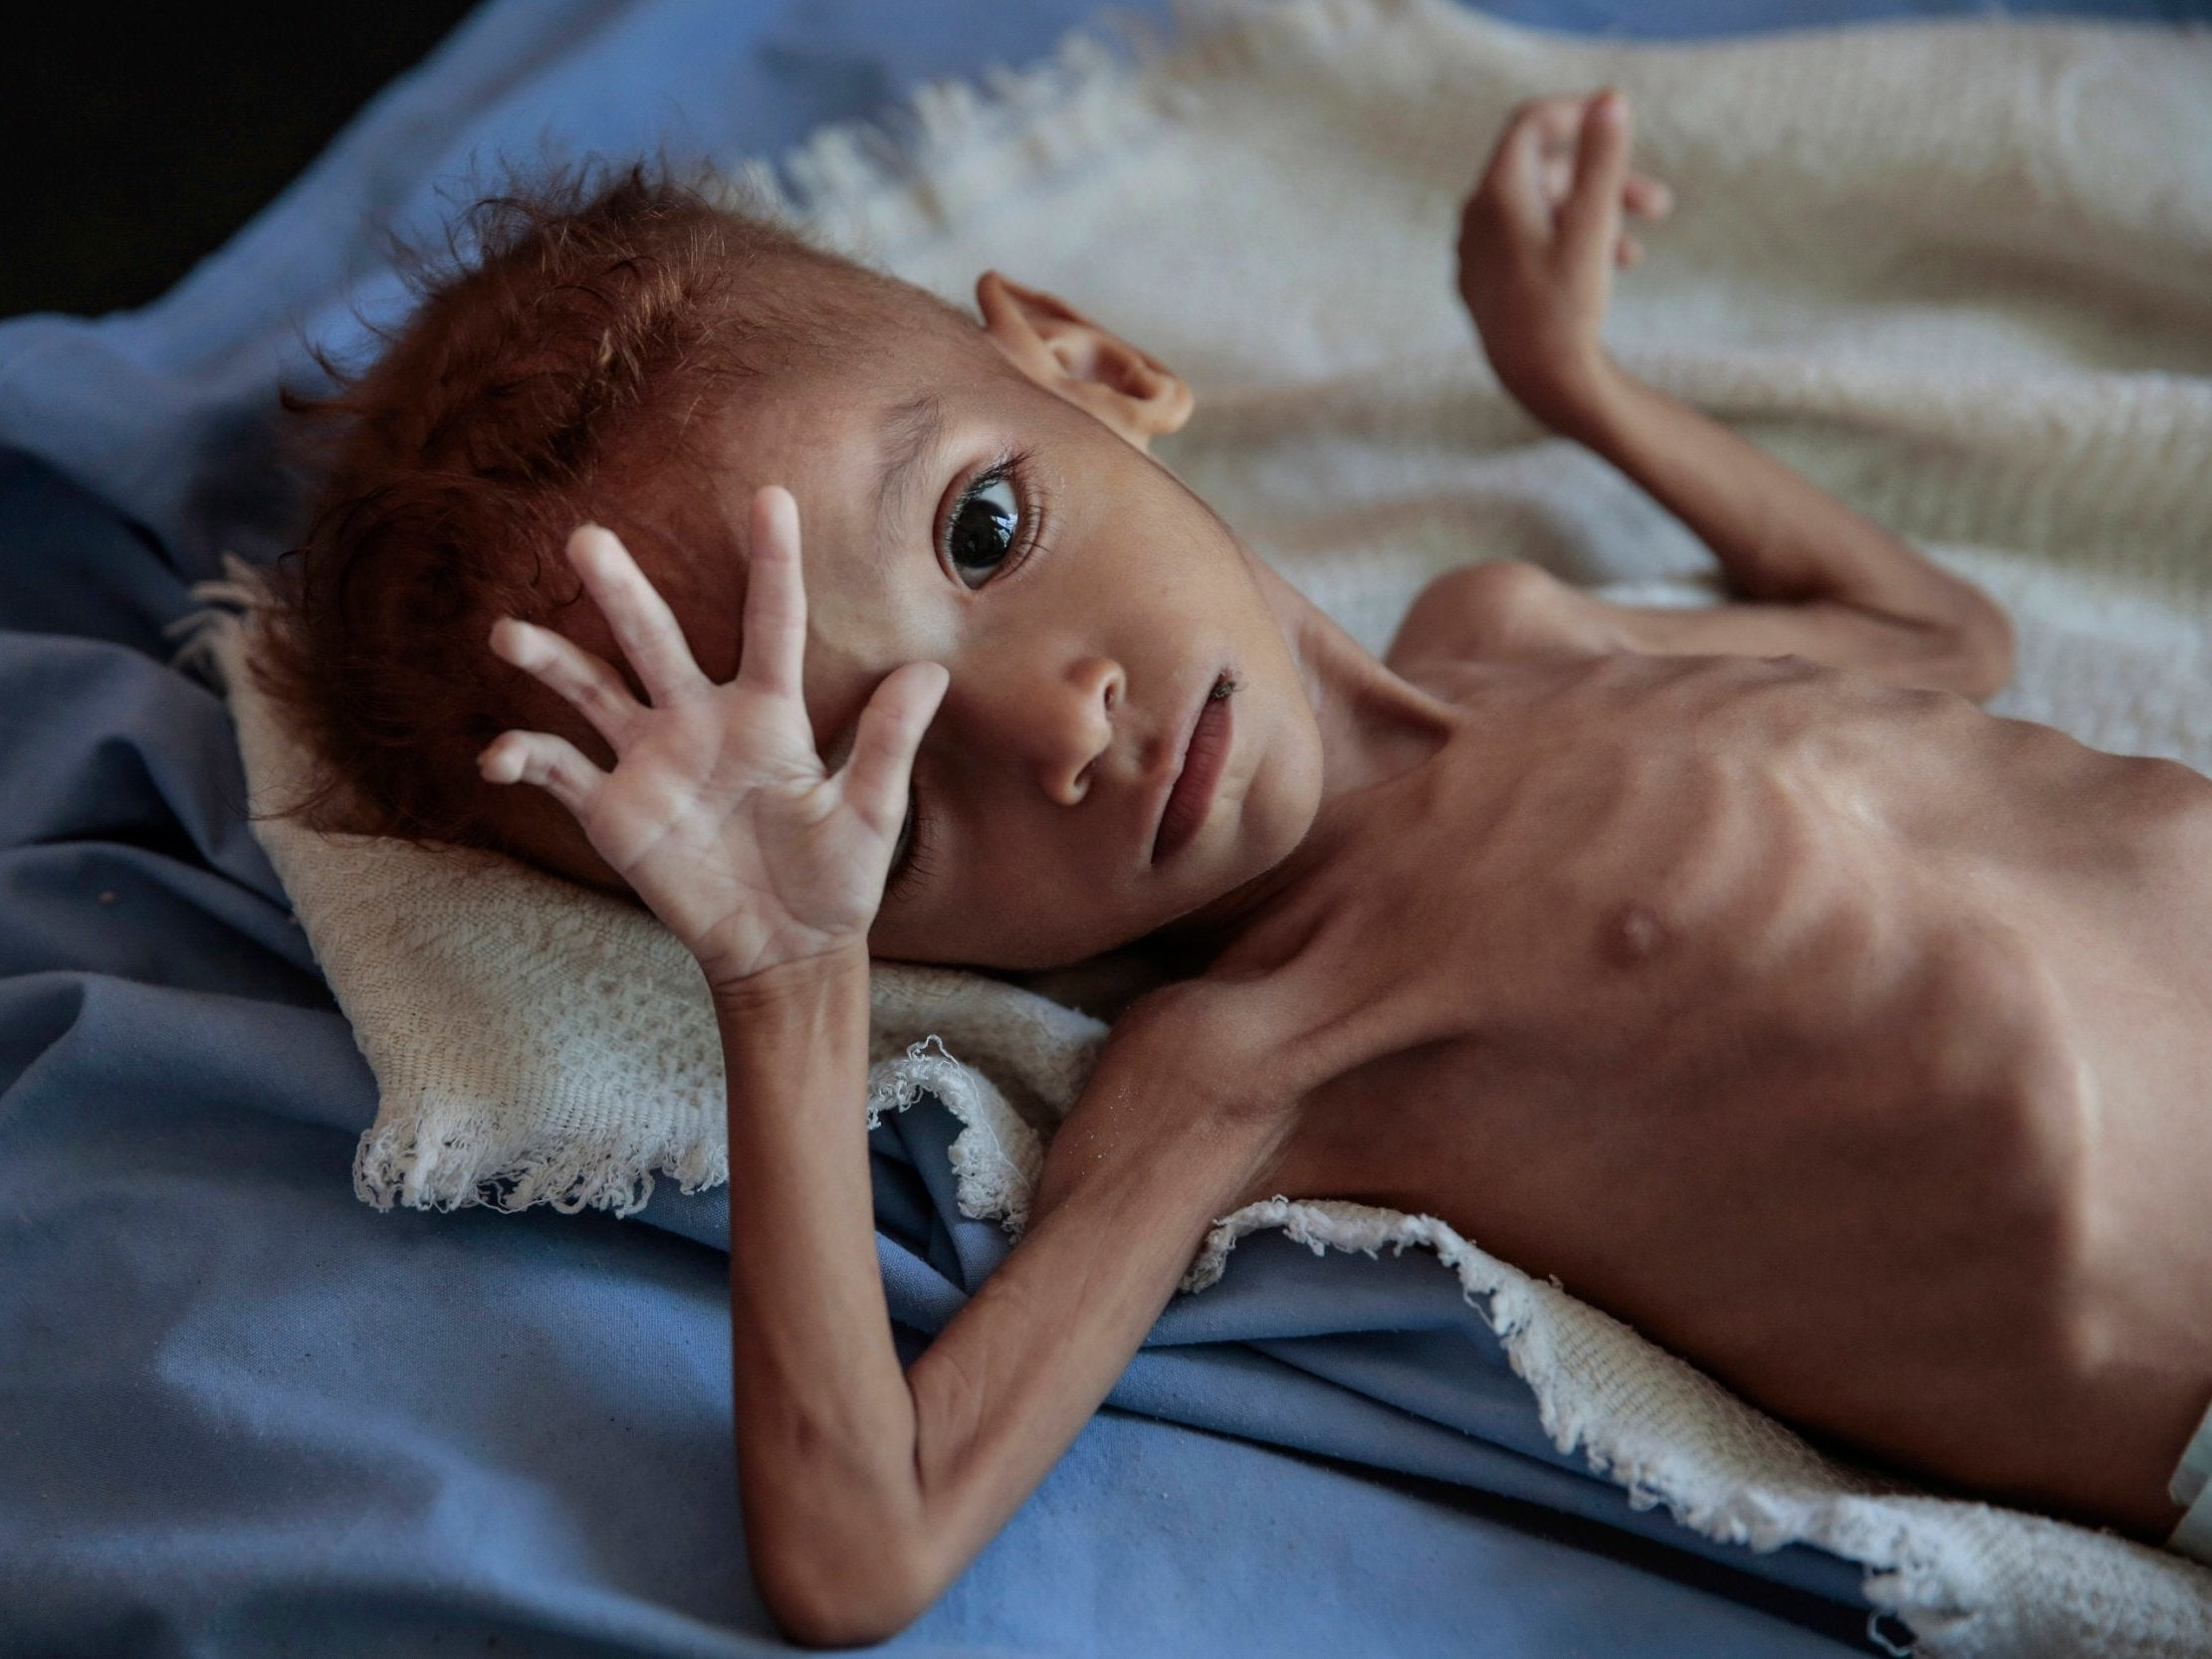 'Irresponsible and incoherent': British-backed bombing raids destroy UK aid in Yemen